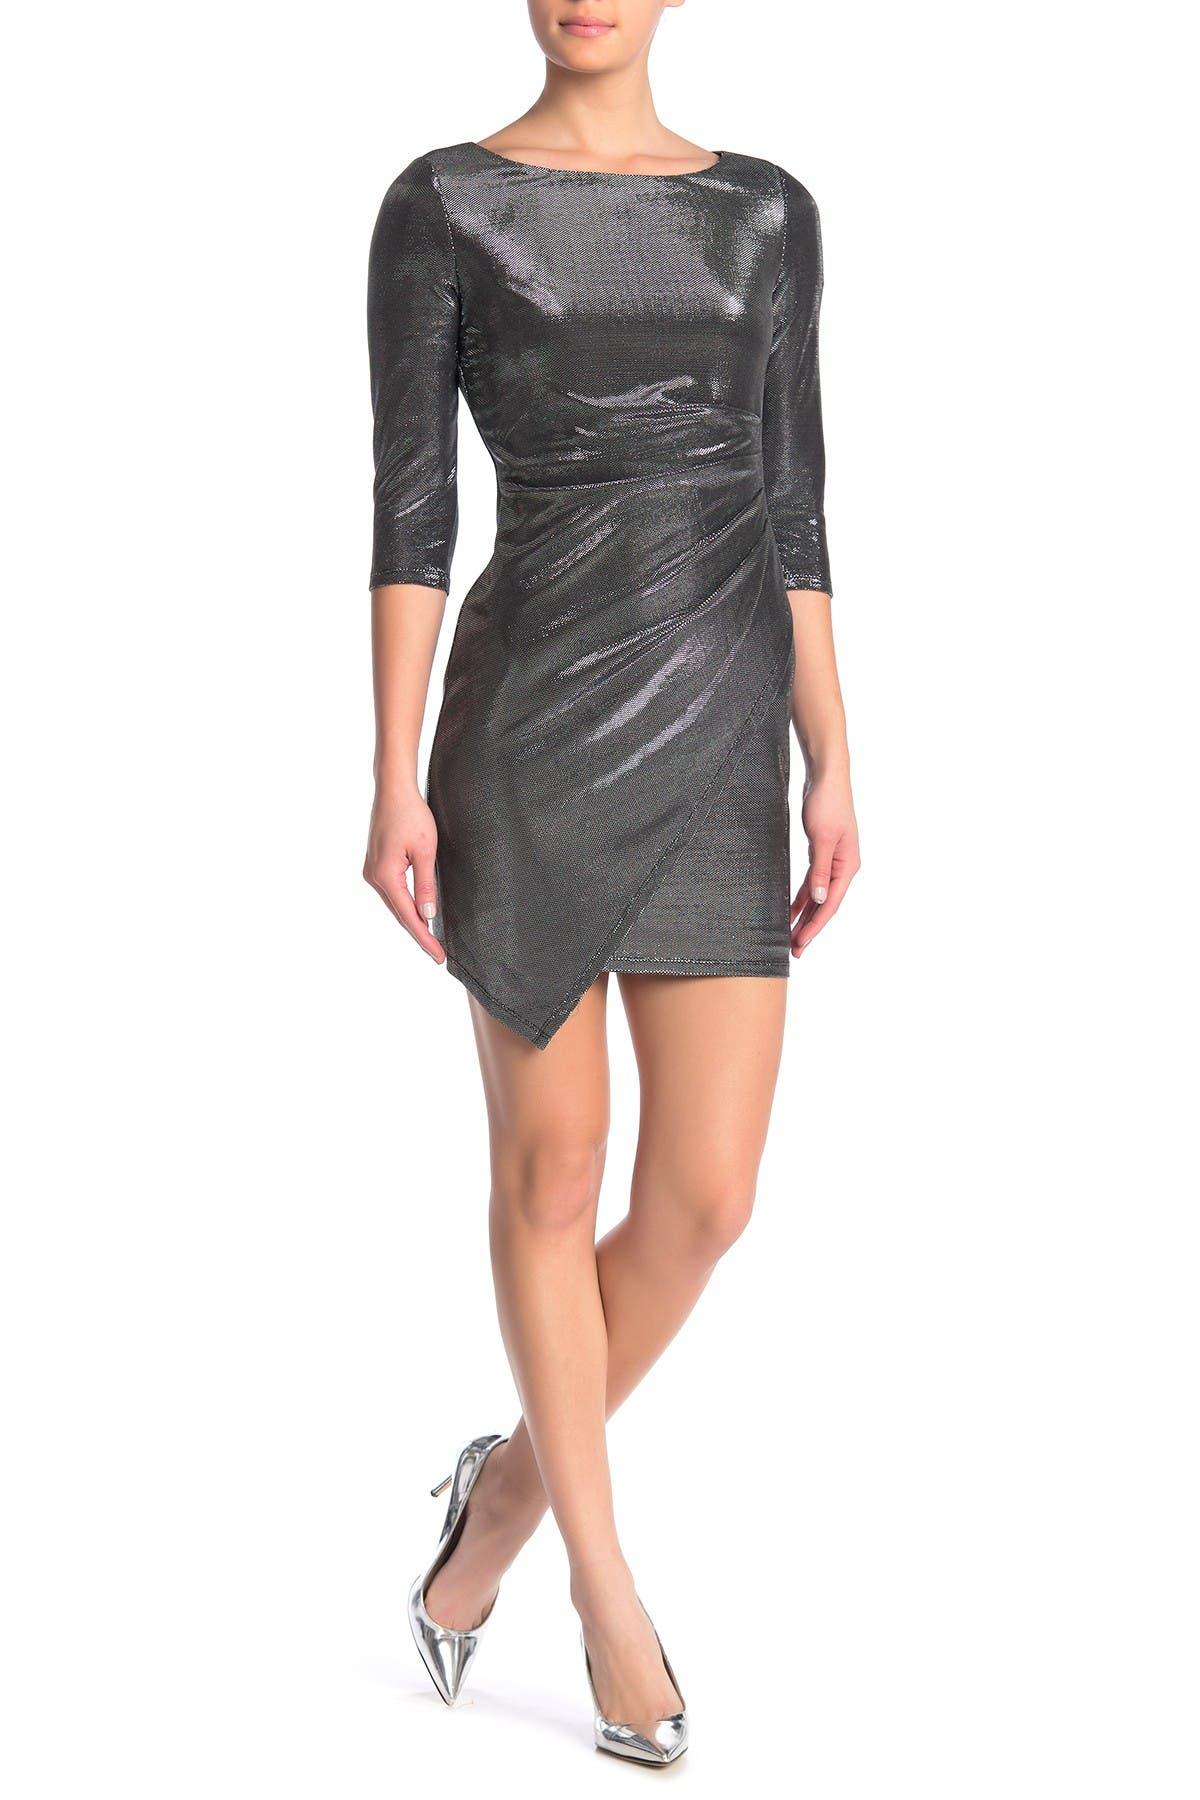 JUMP Metallic Draped Hem Bodycon Dress